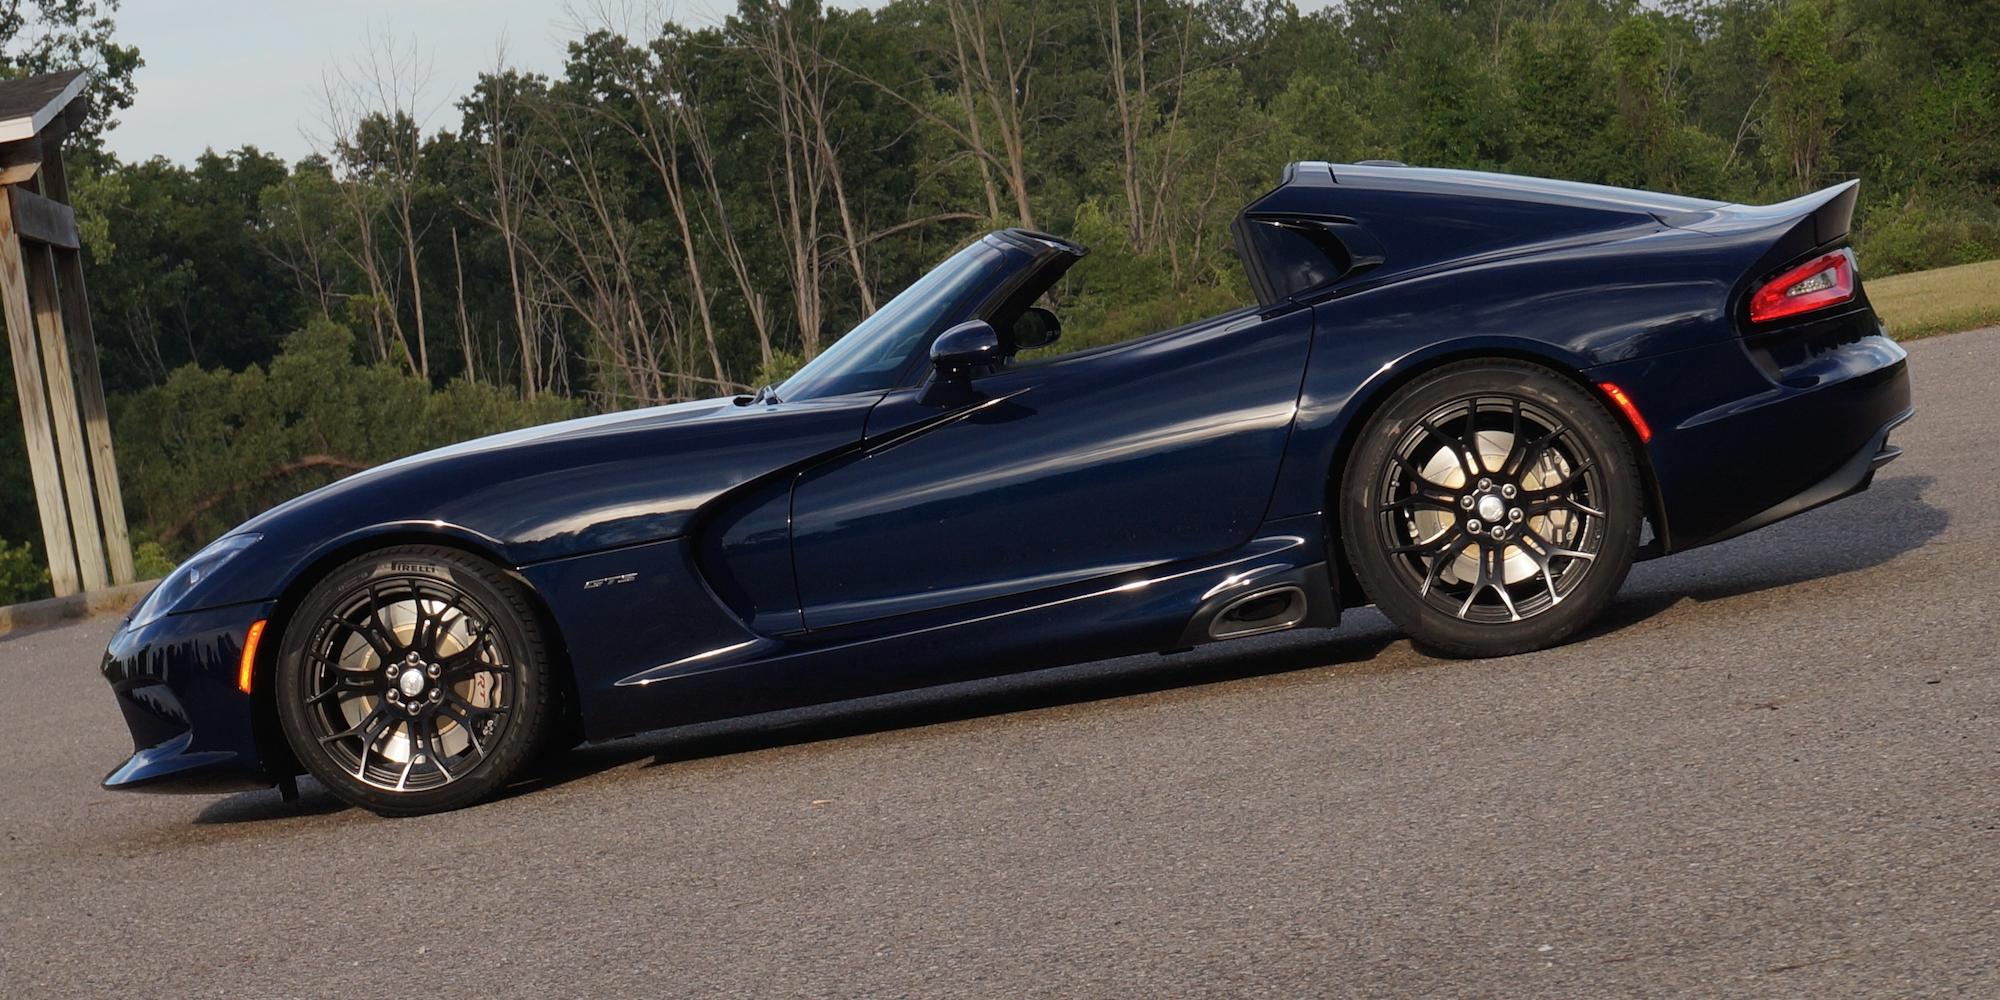 How One Company Built The Viper Targa Dodge Wouldn T Dodge Viper Dodge Dodge Viper Gts